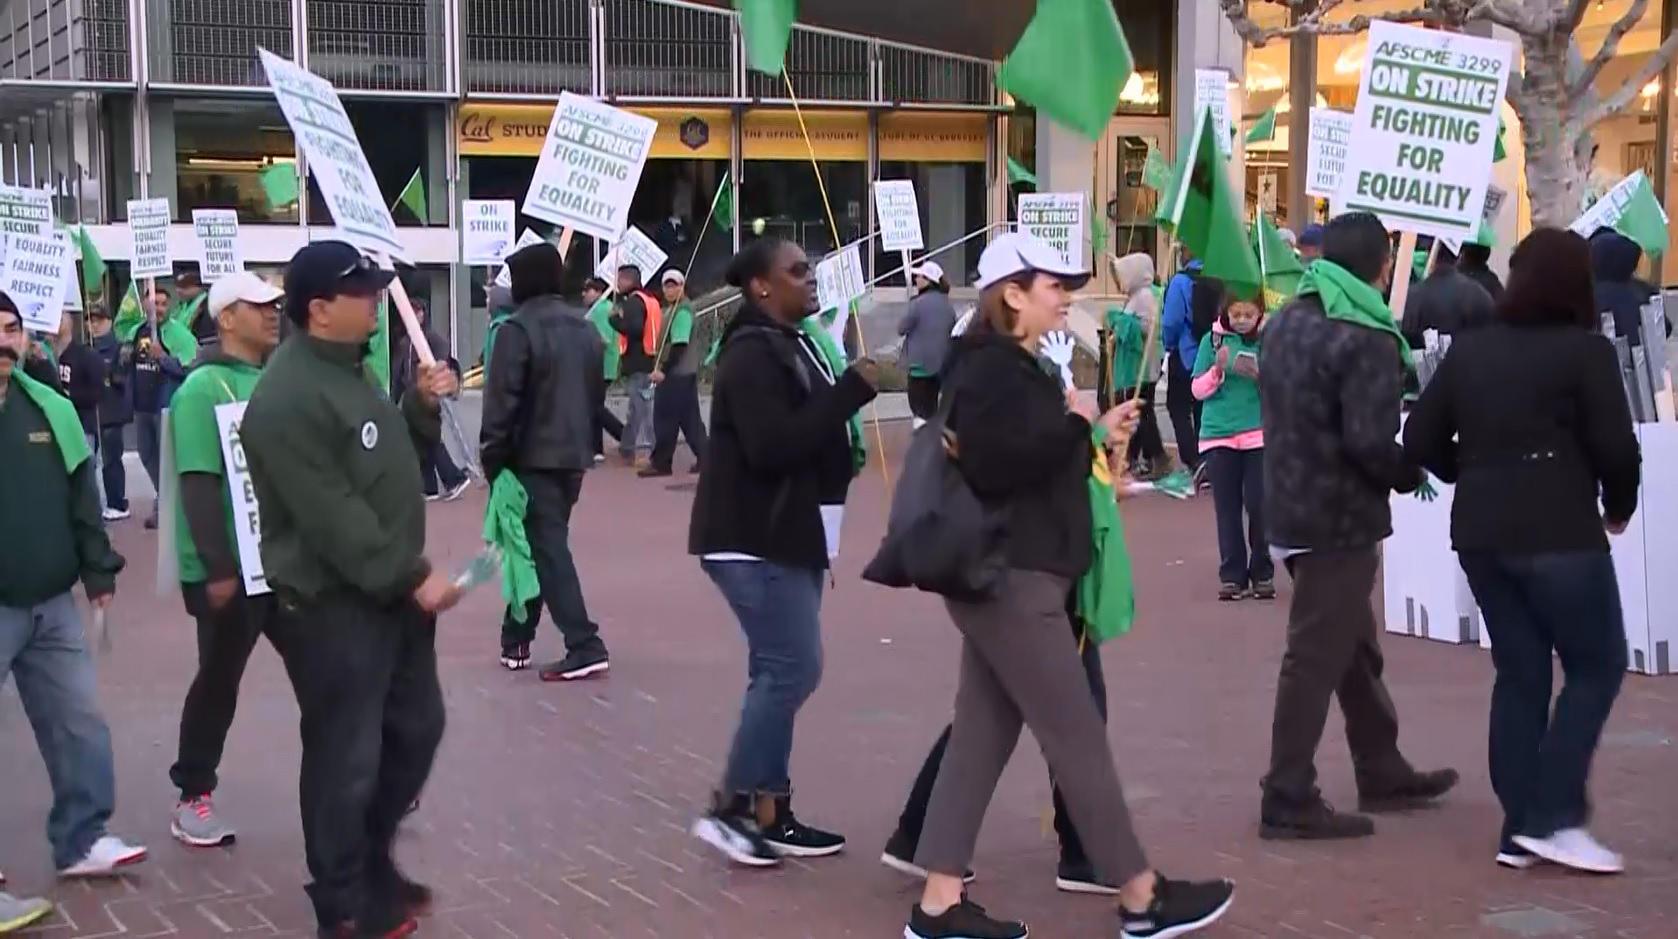 UC strike 2018: University of California workers go on